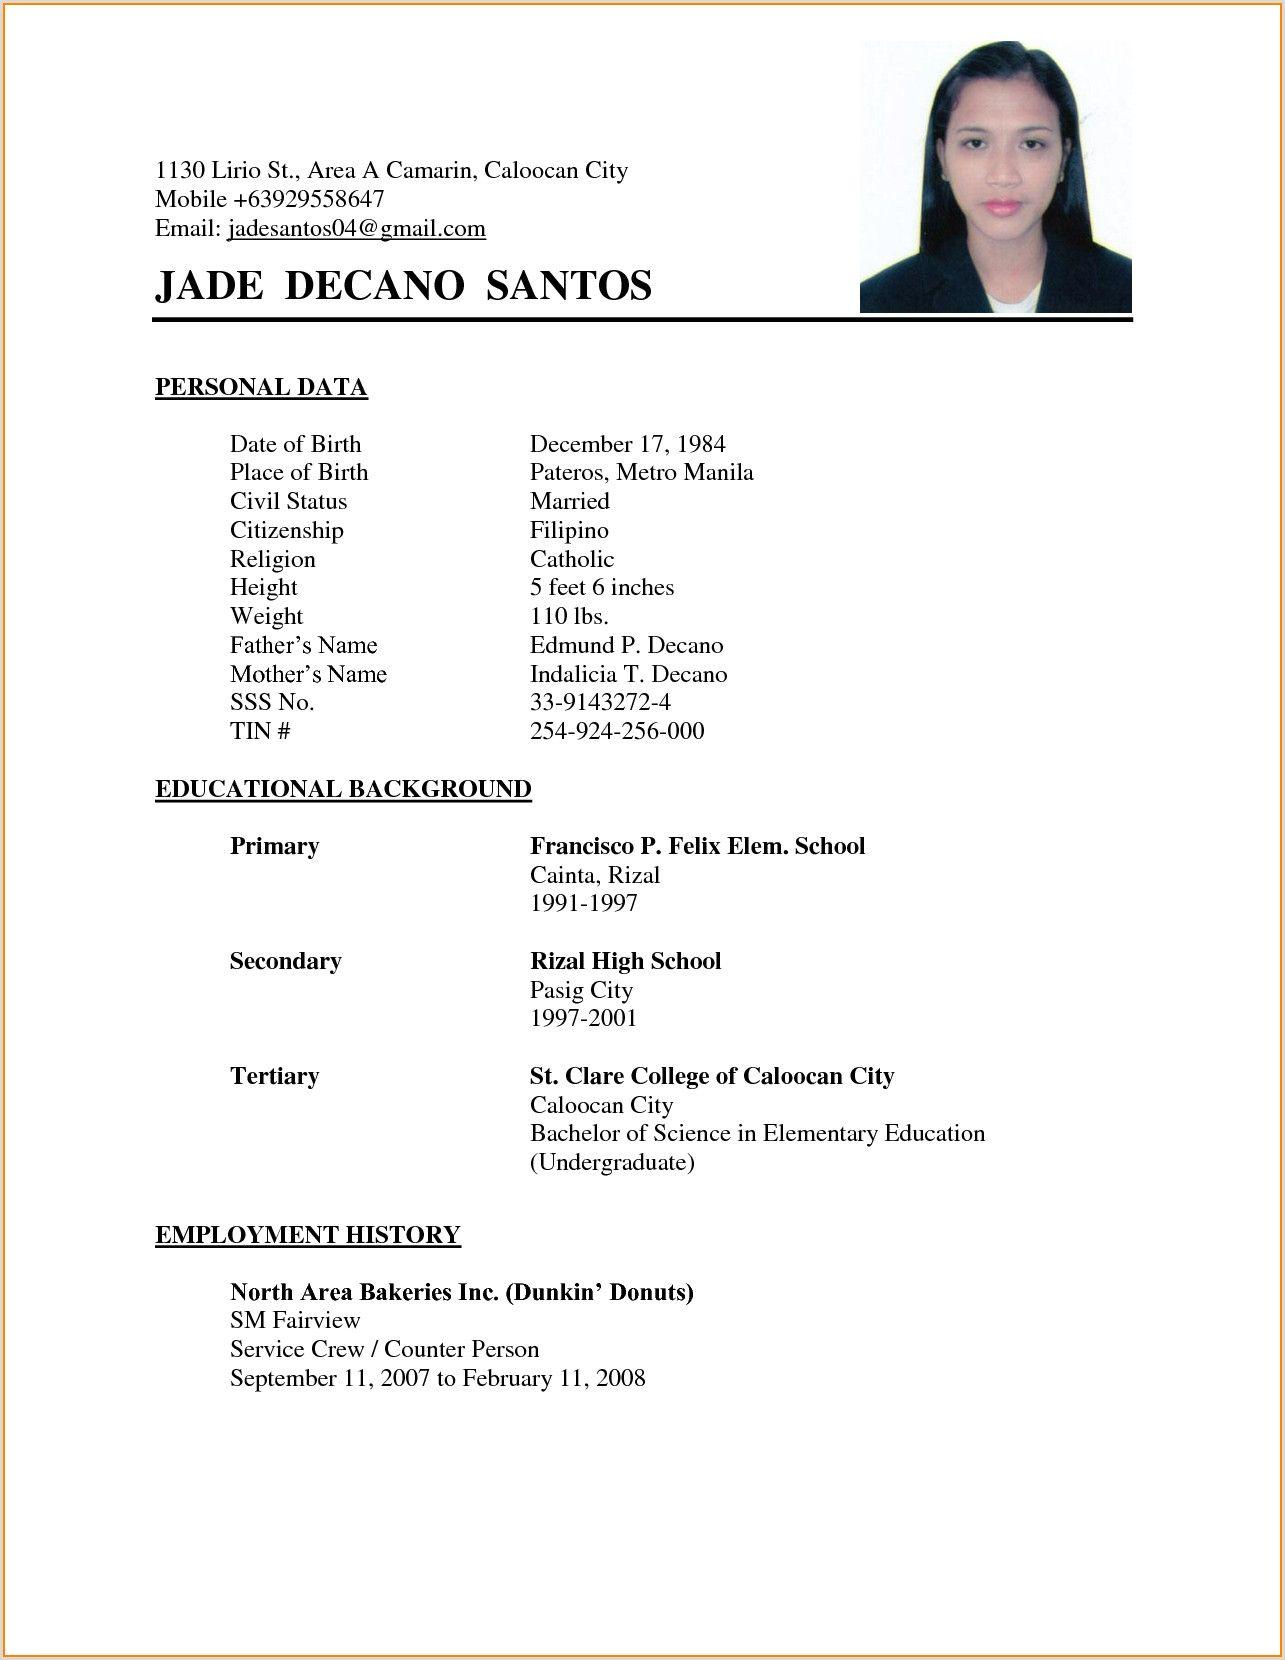 Standard Cv Format In Pakistan Basic Resume Basic Resume Examples Simple Resume Format Simple resume format for job